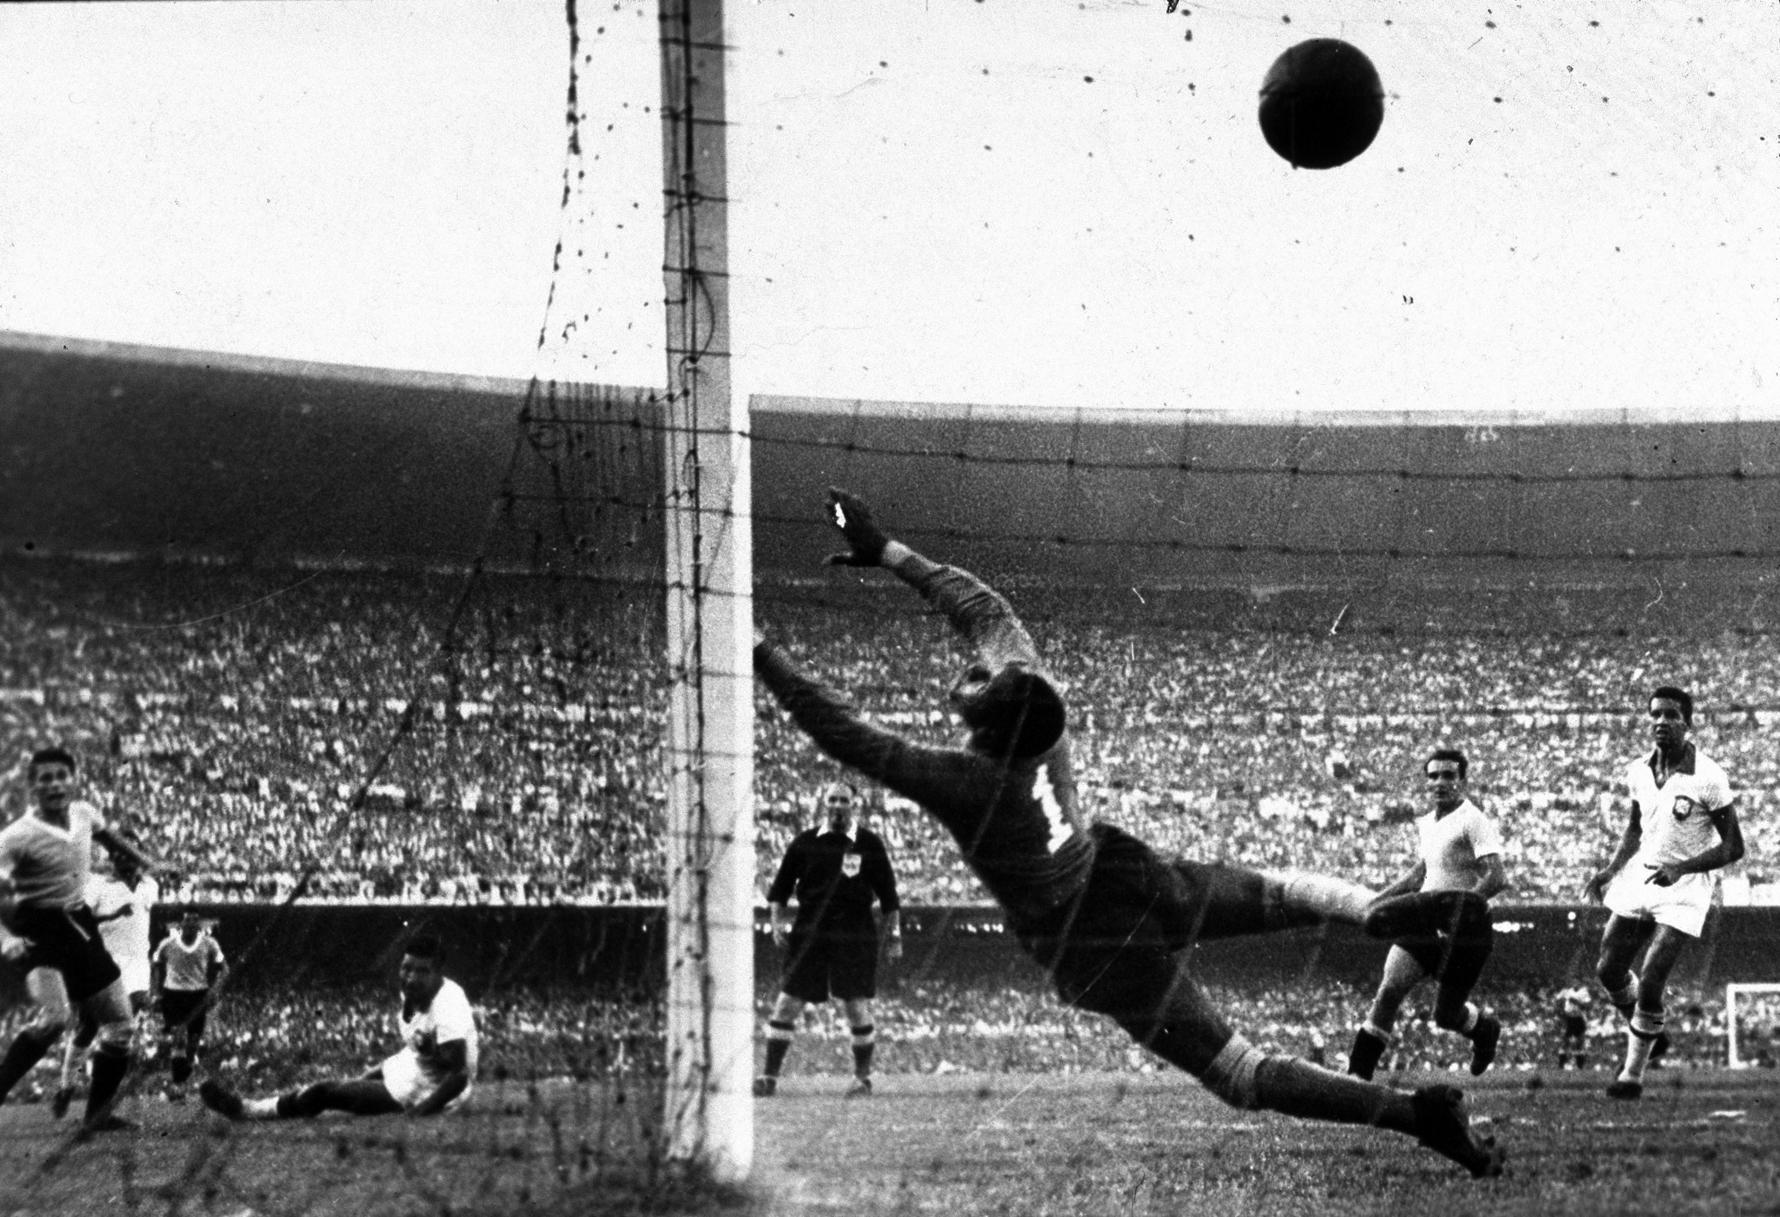 Brazil-Uruguay World Cup 1950